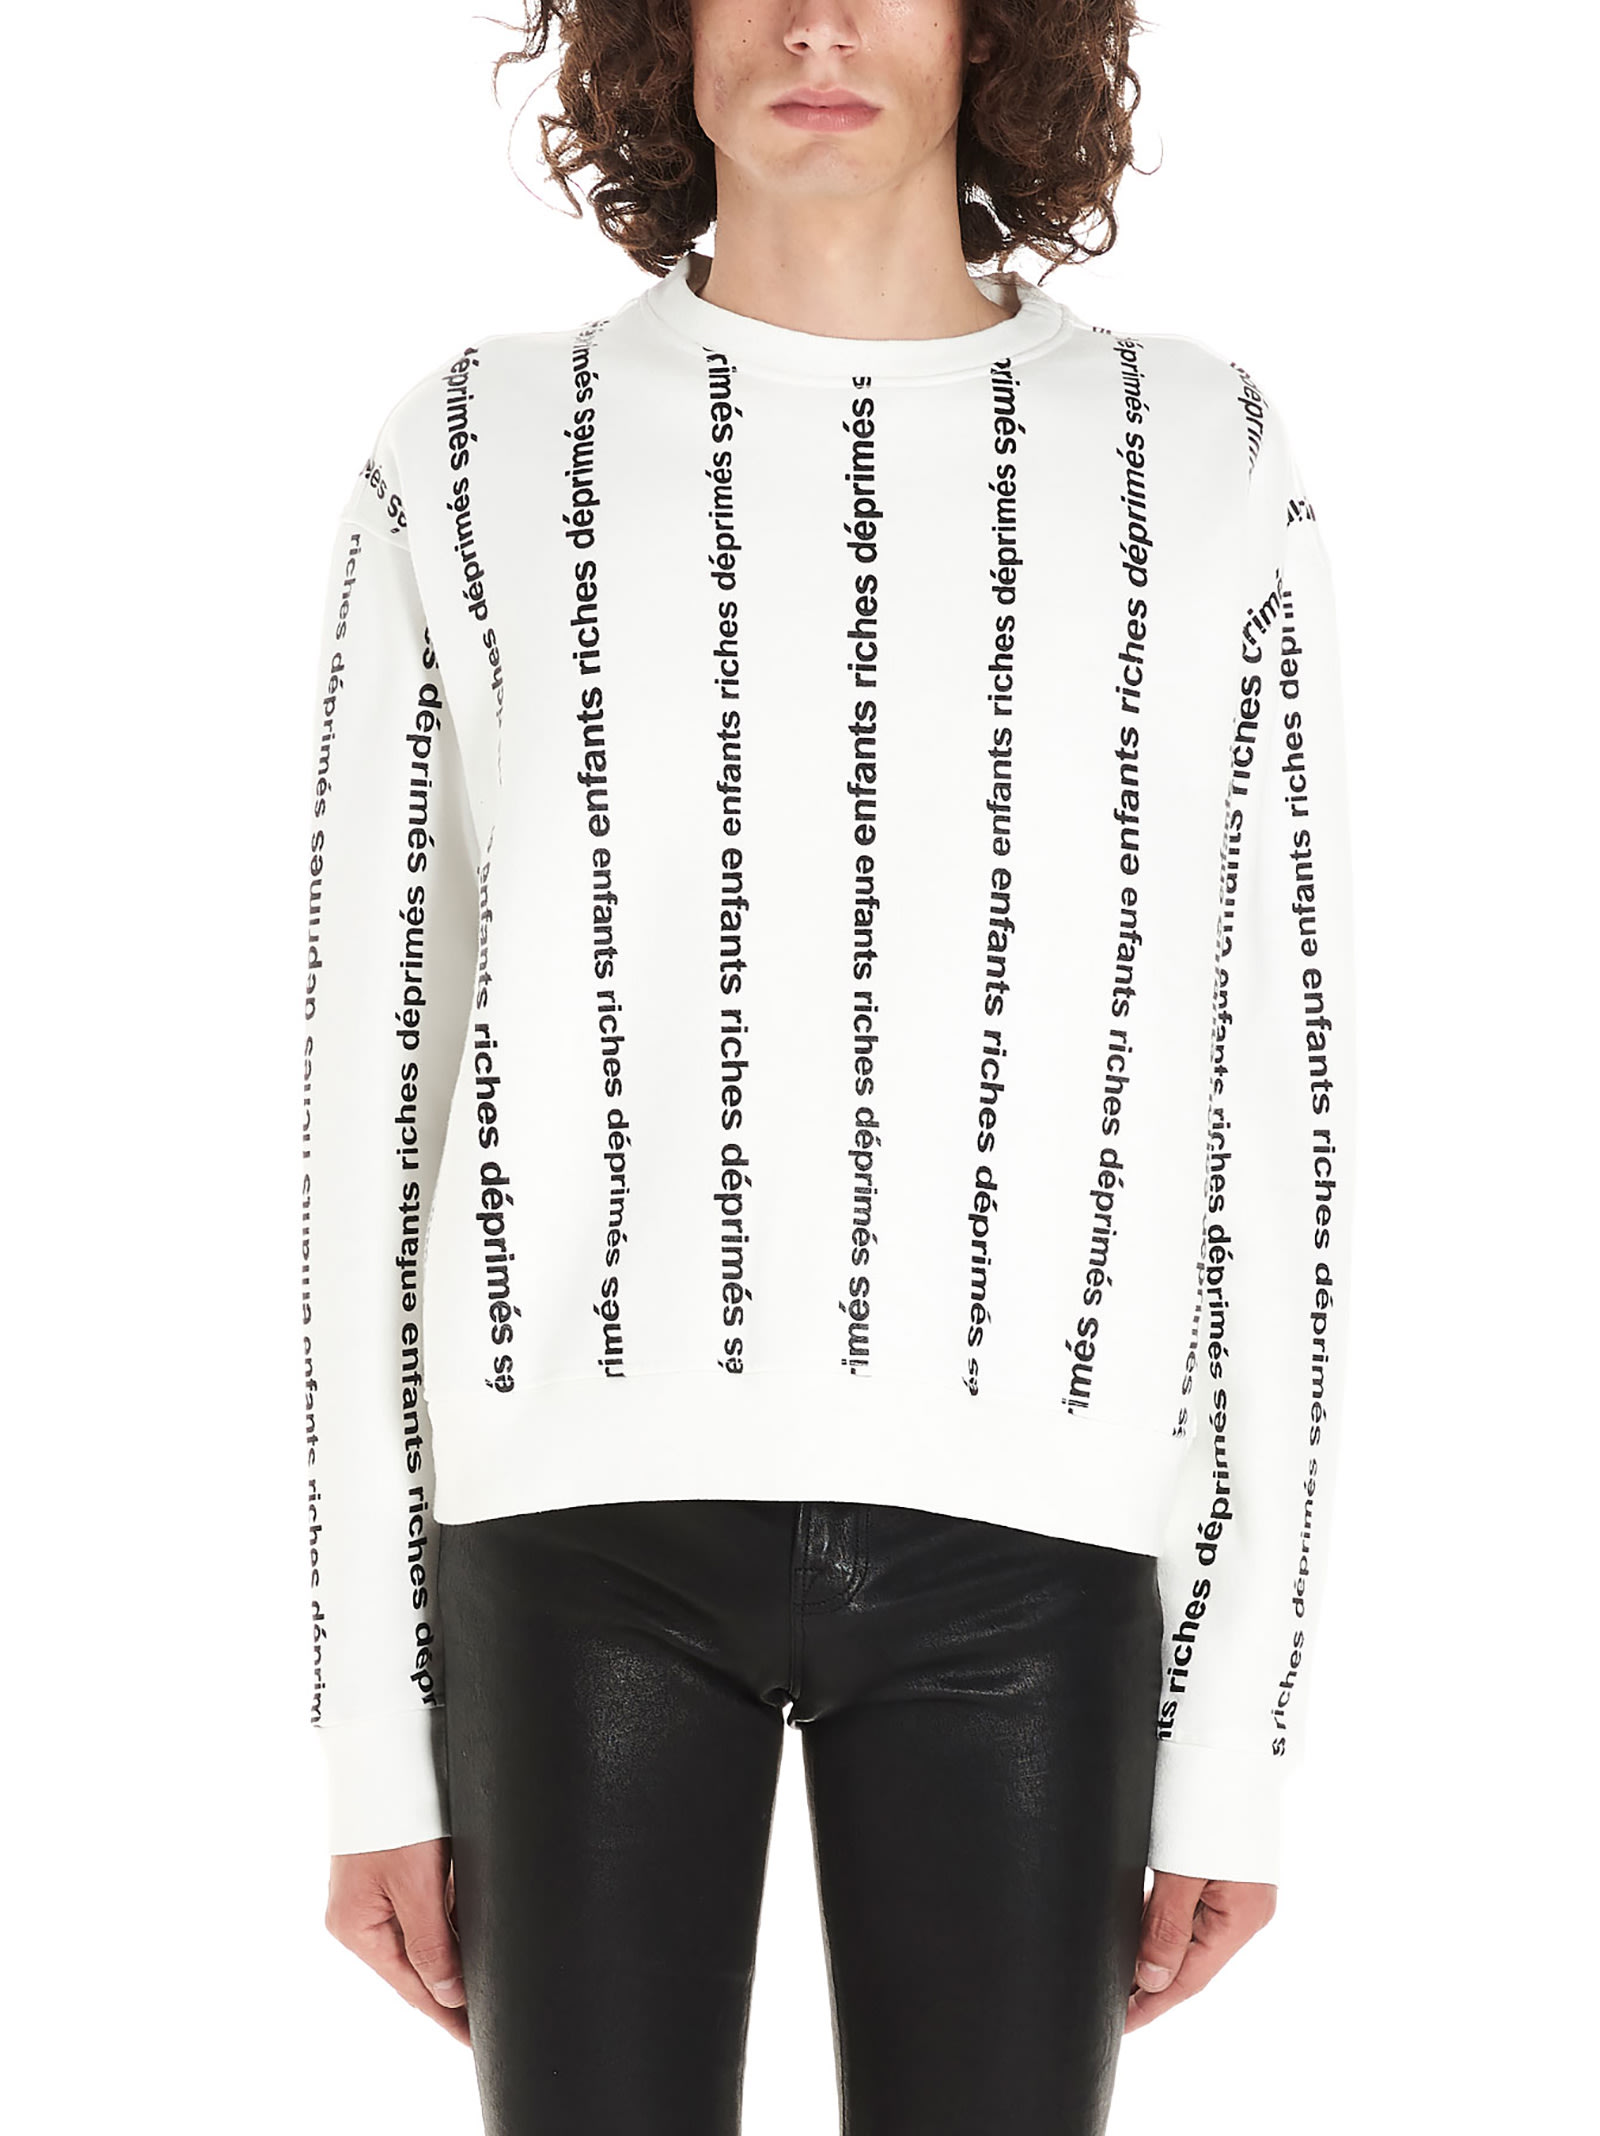 Enfants Riches Deprimes logo Stripe Sweatshirt